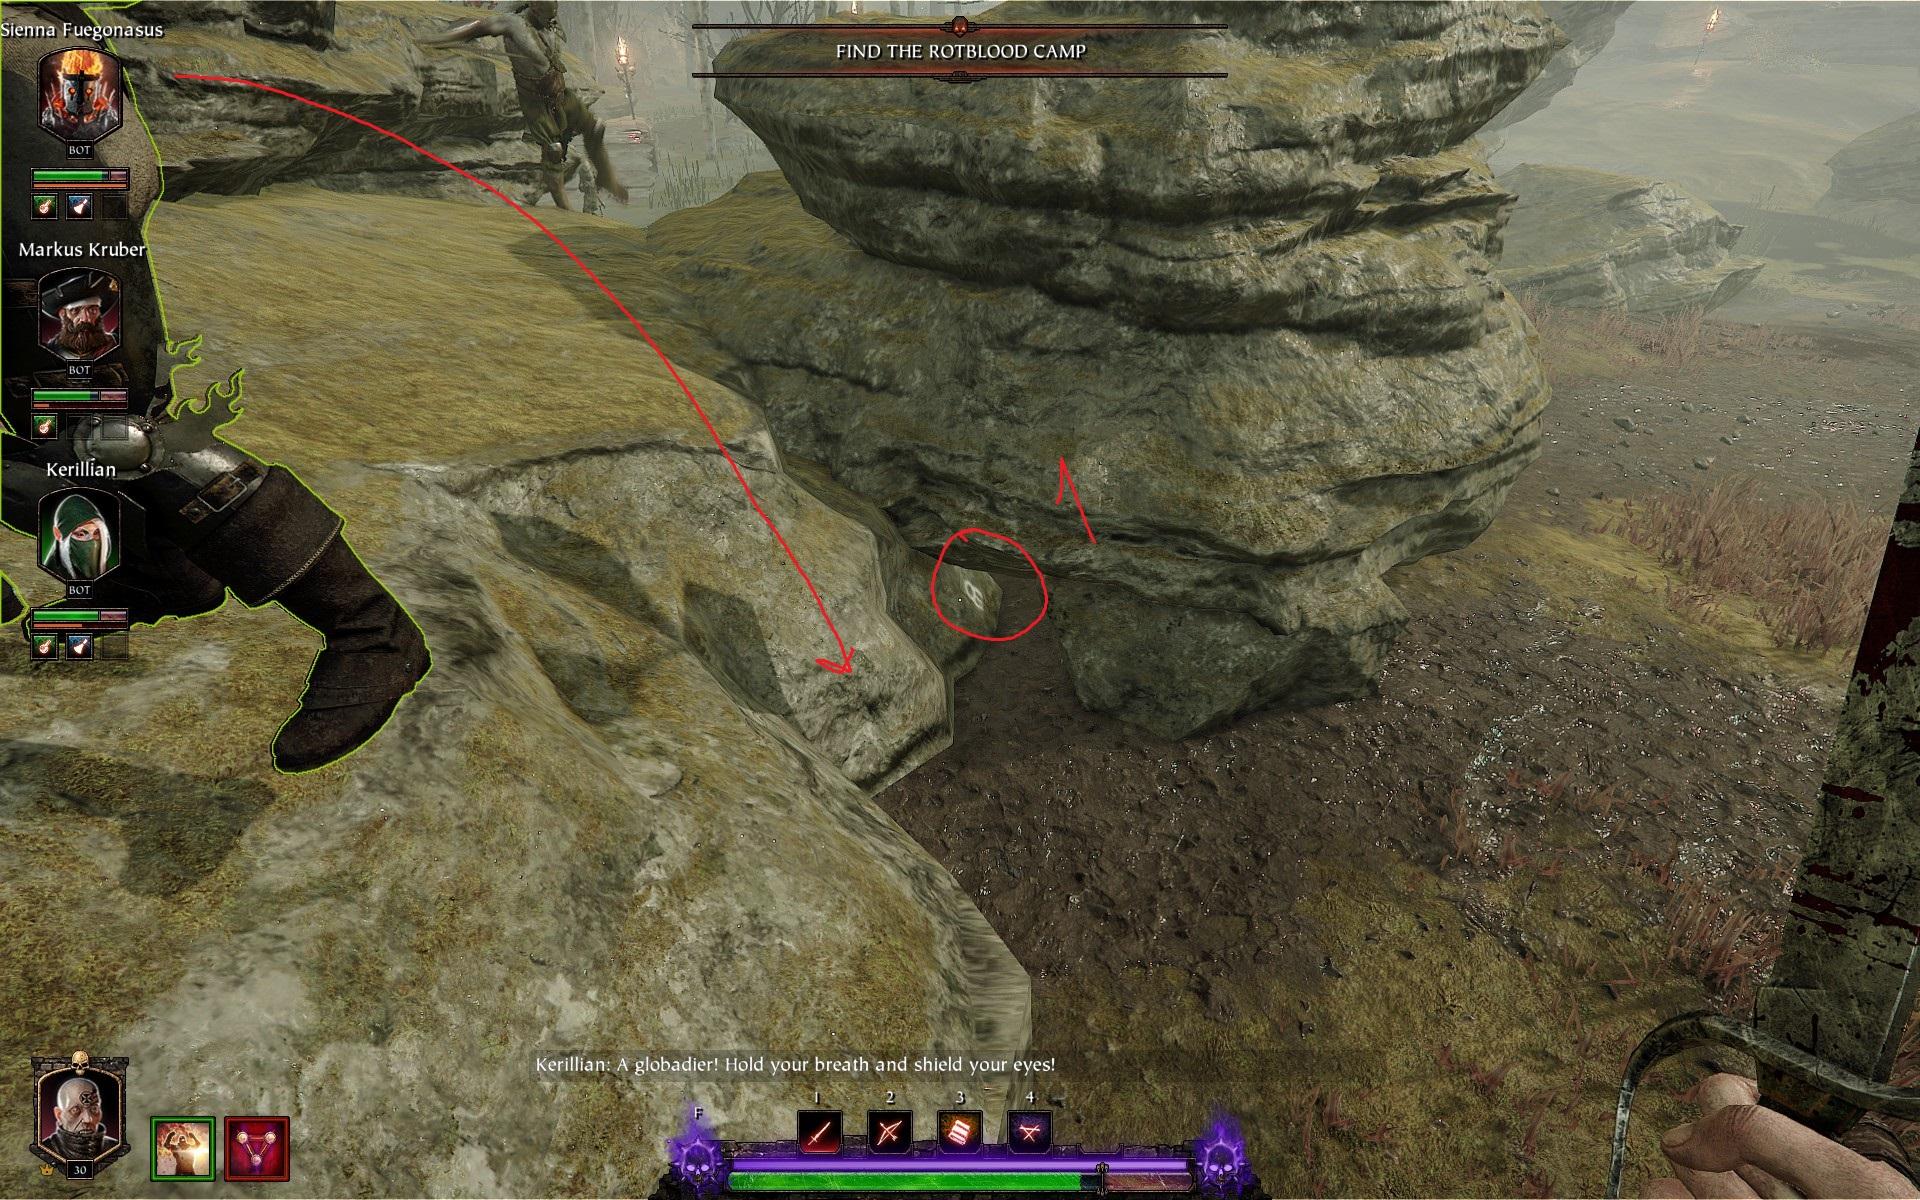 Все тома и гримуары из Warhammer: Vermintide 2